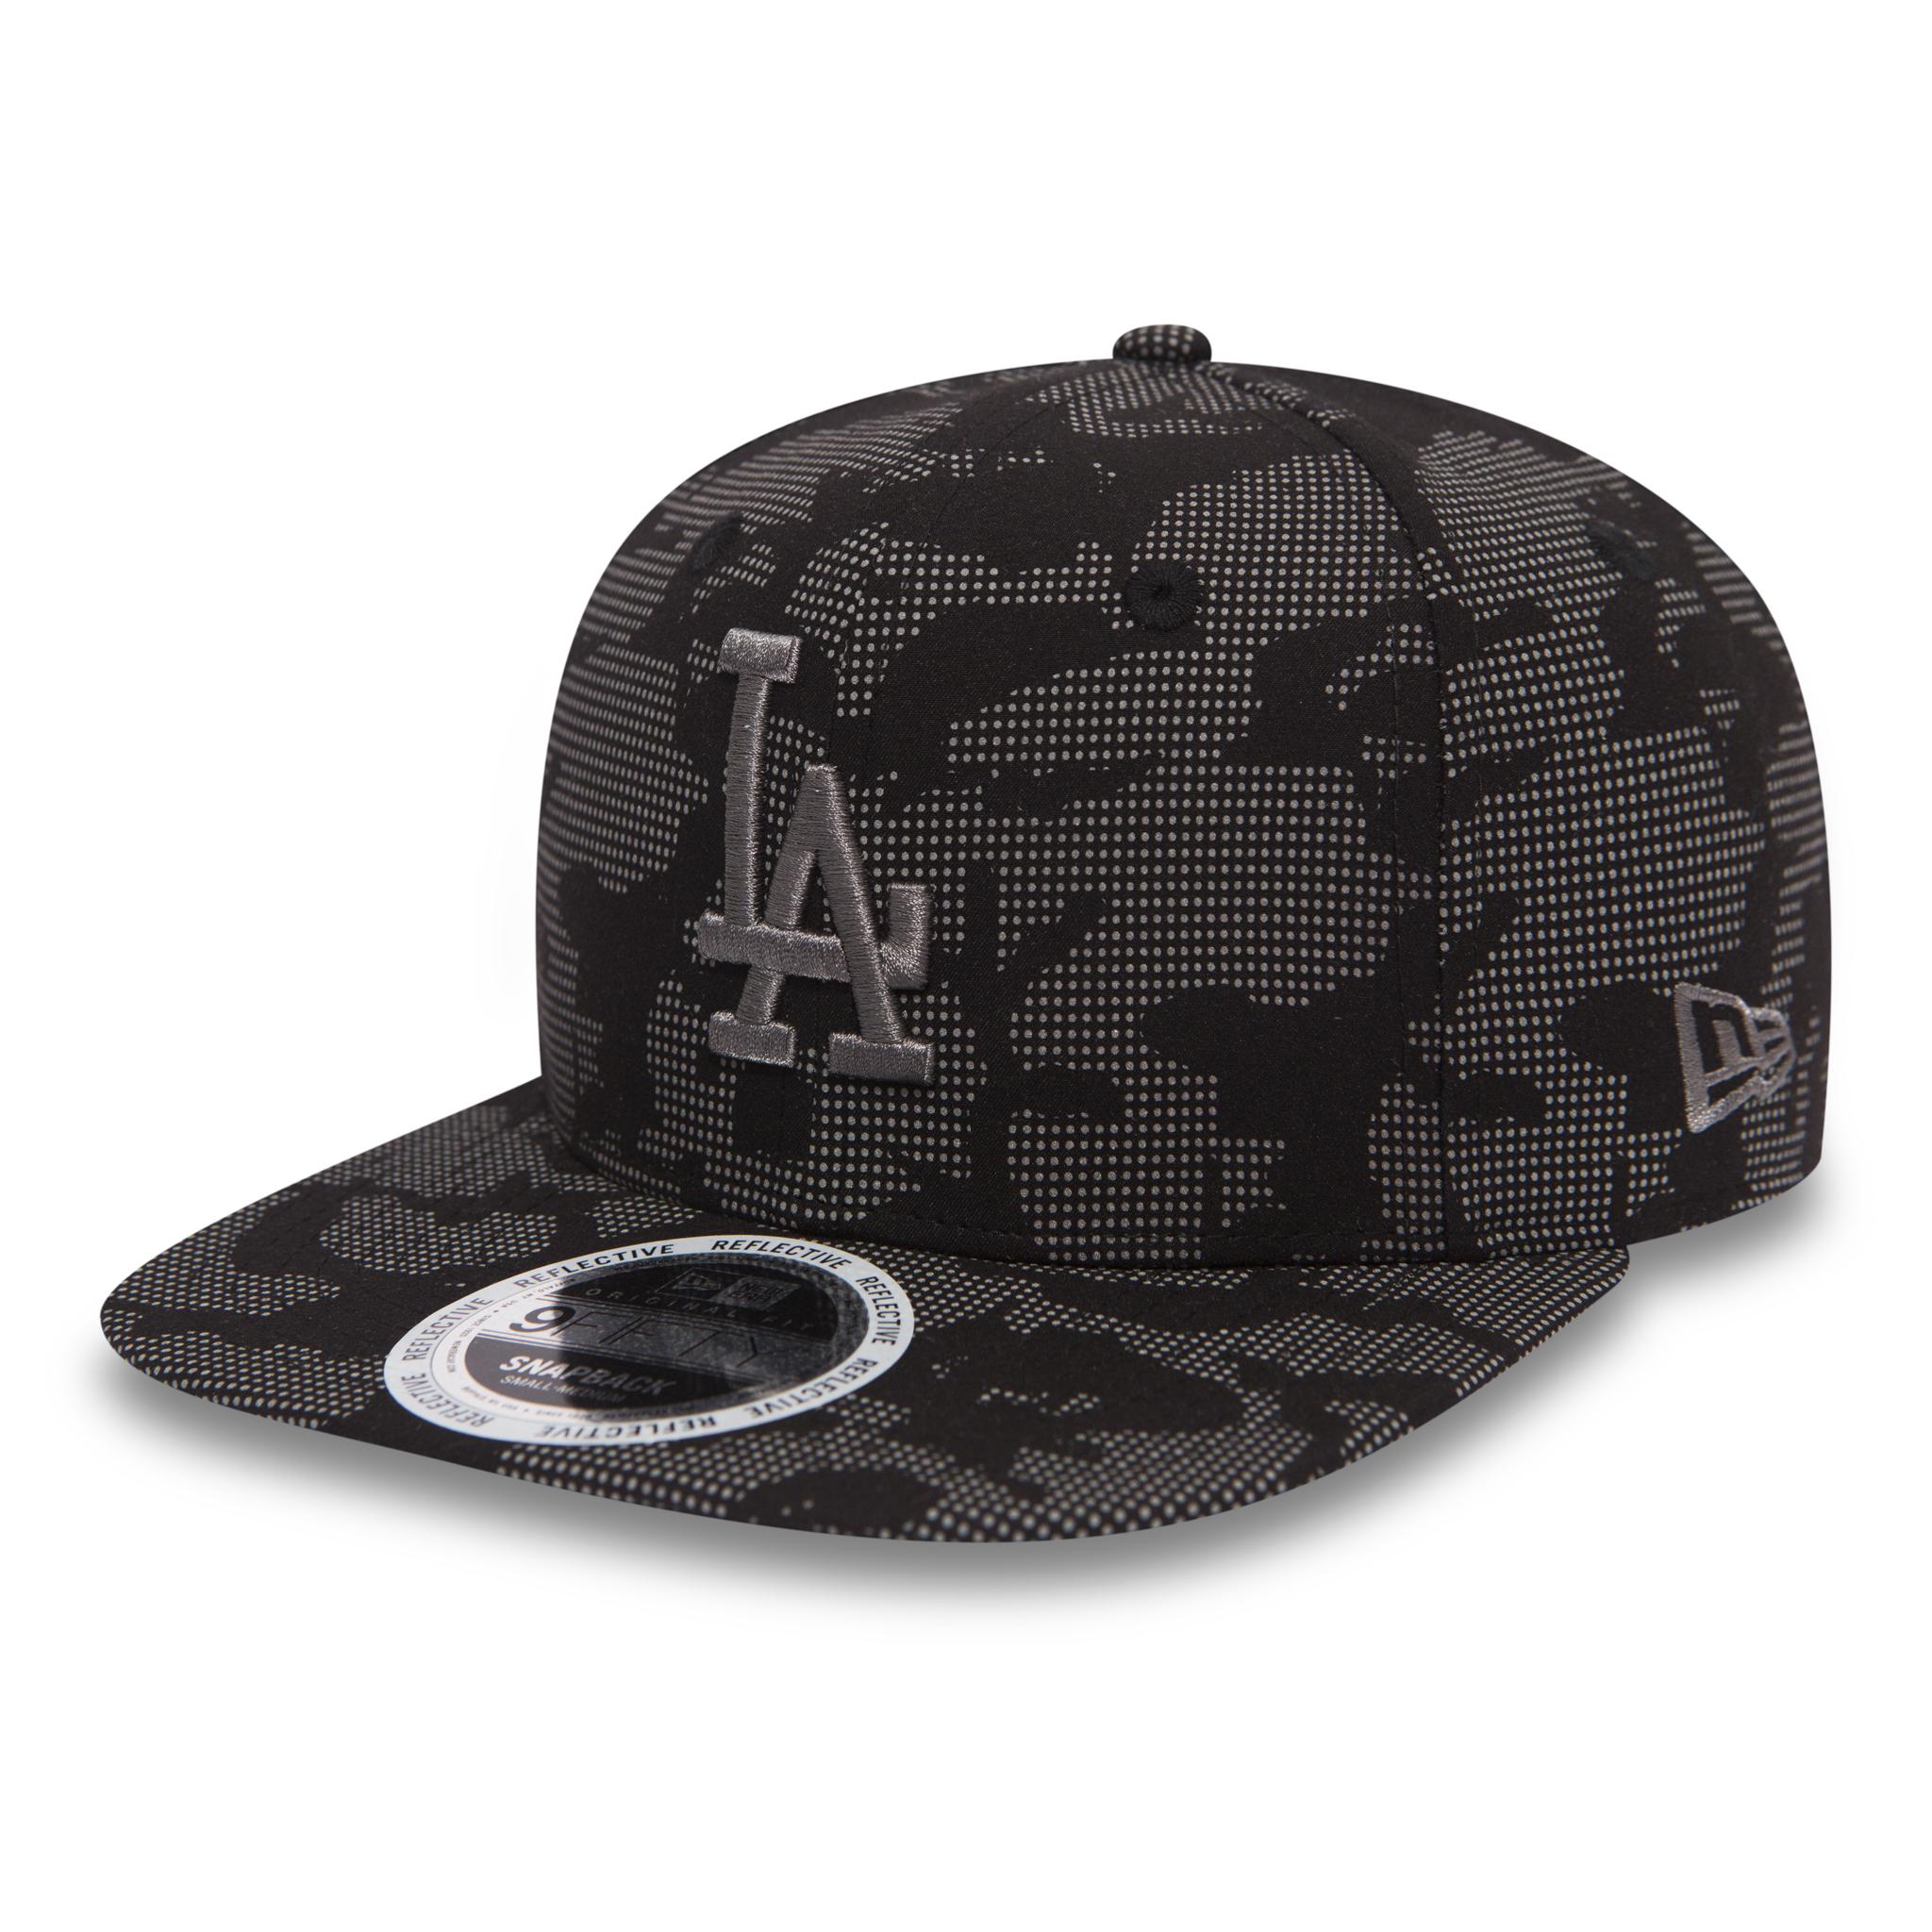 f3a418d73 Details about New Era MLB Night Time Reflective 950 LA Dodgers Snapback Cap  Black